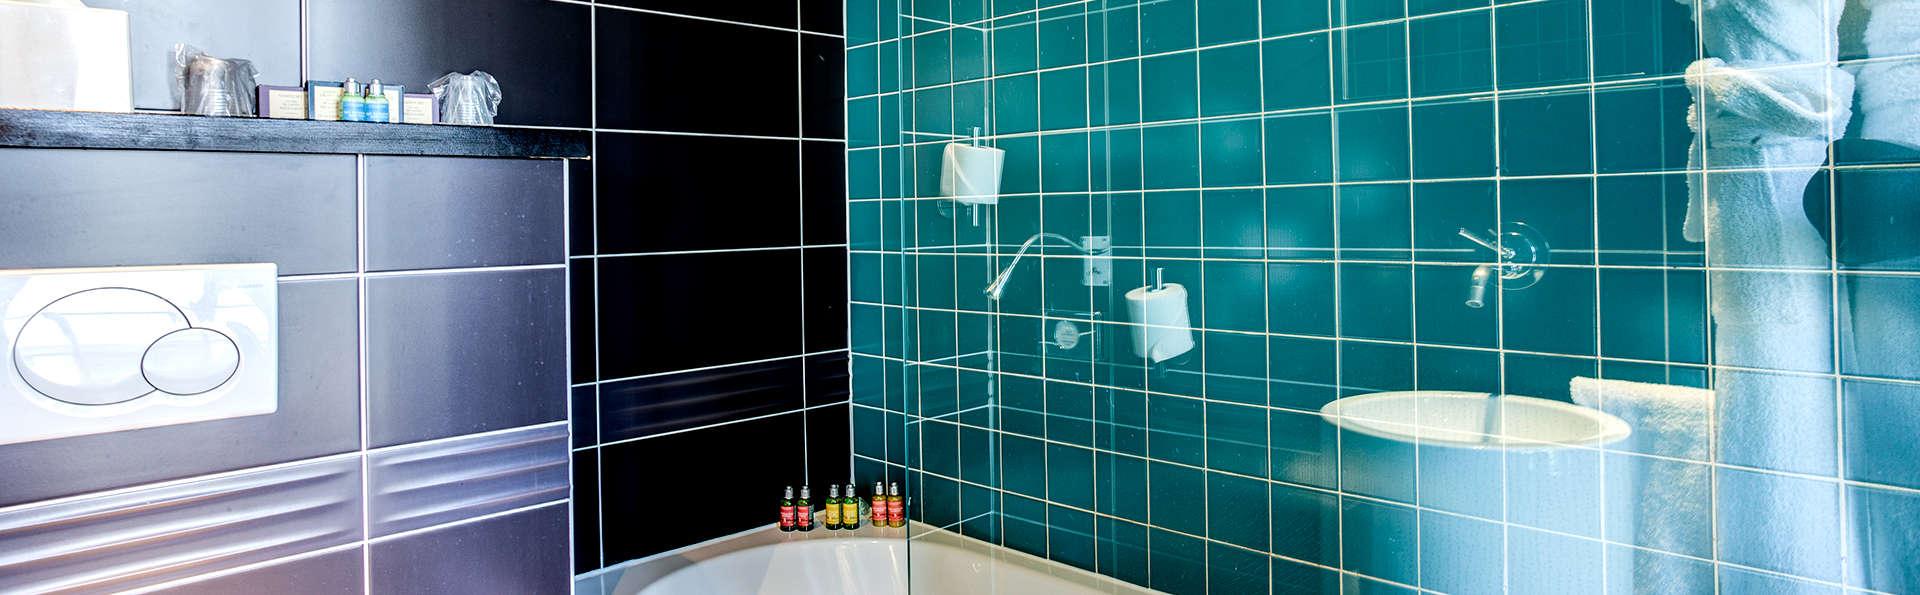 Five Boutique Hotel Paris Quartier Latin  - Edit_Bathroom2.jpg